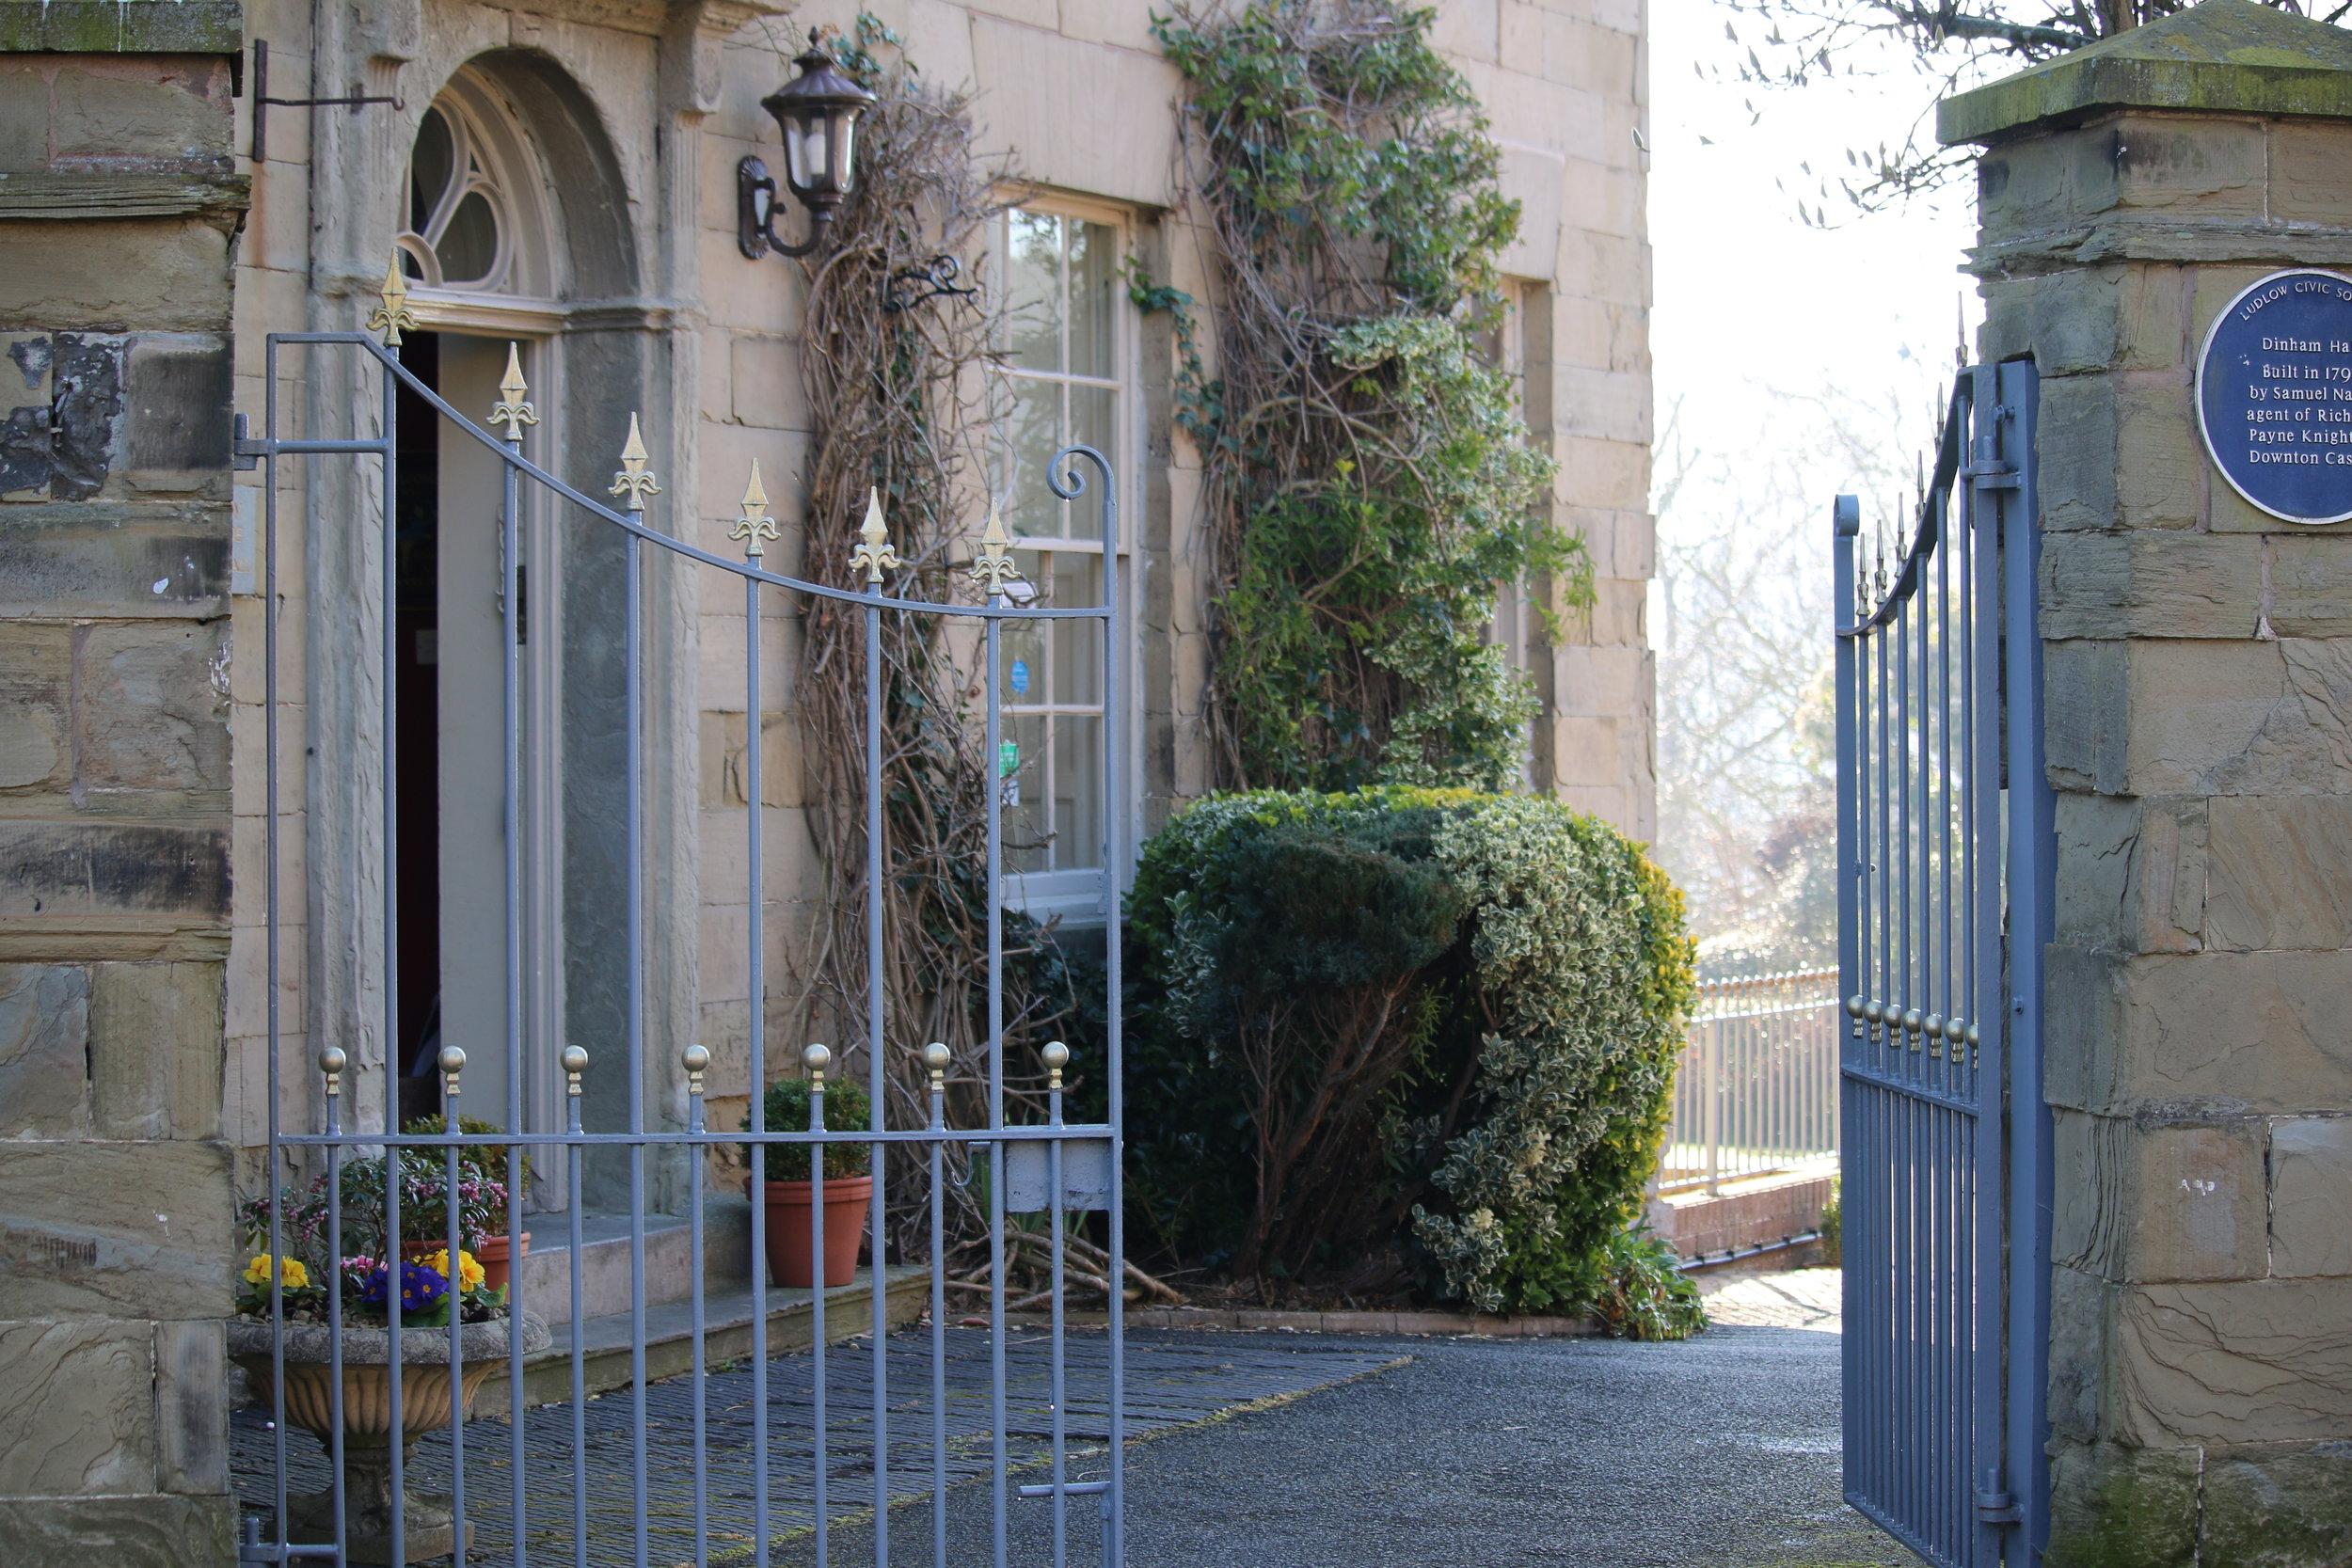 The elegant Georgian entrance to Dinham Hall Hotel